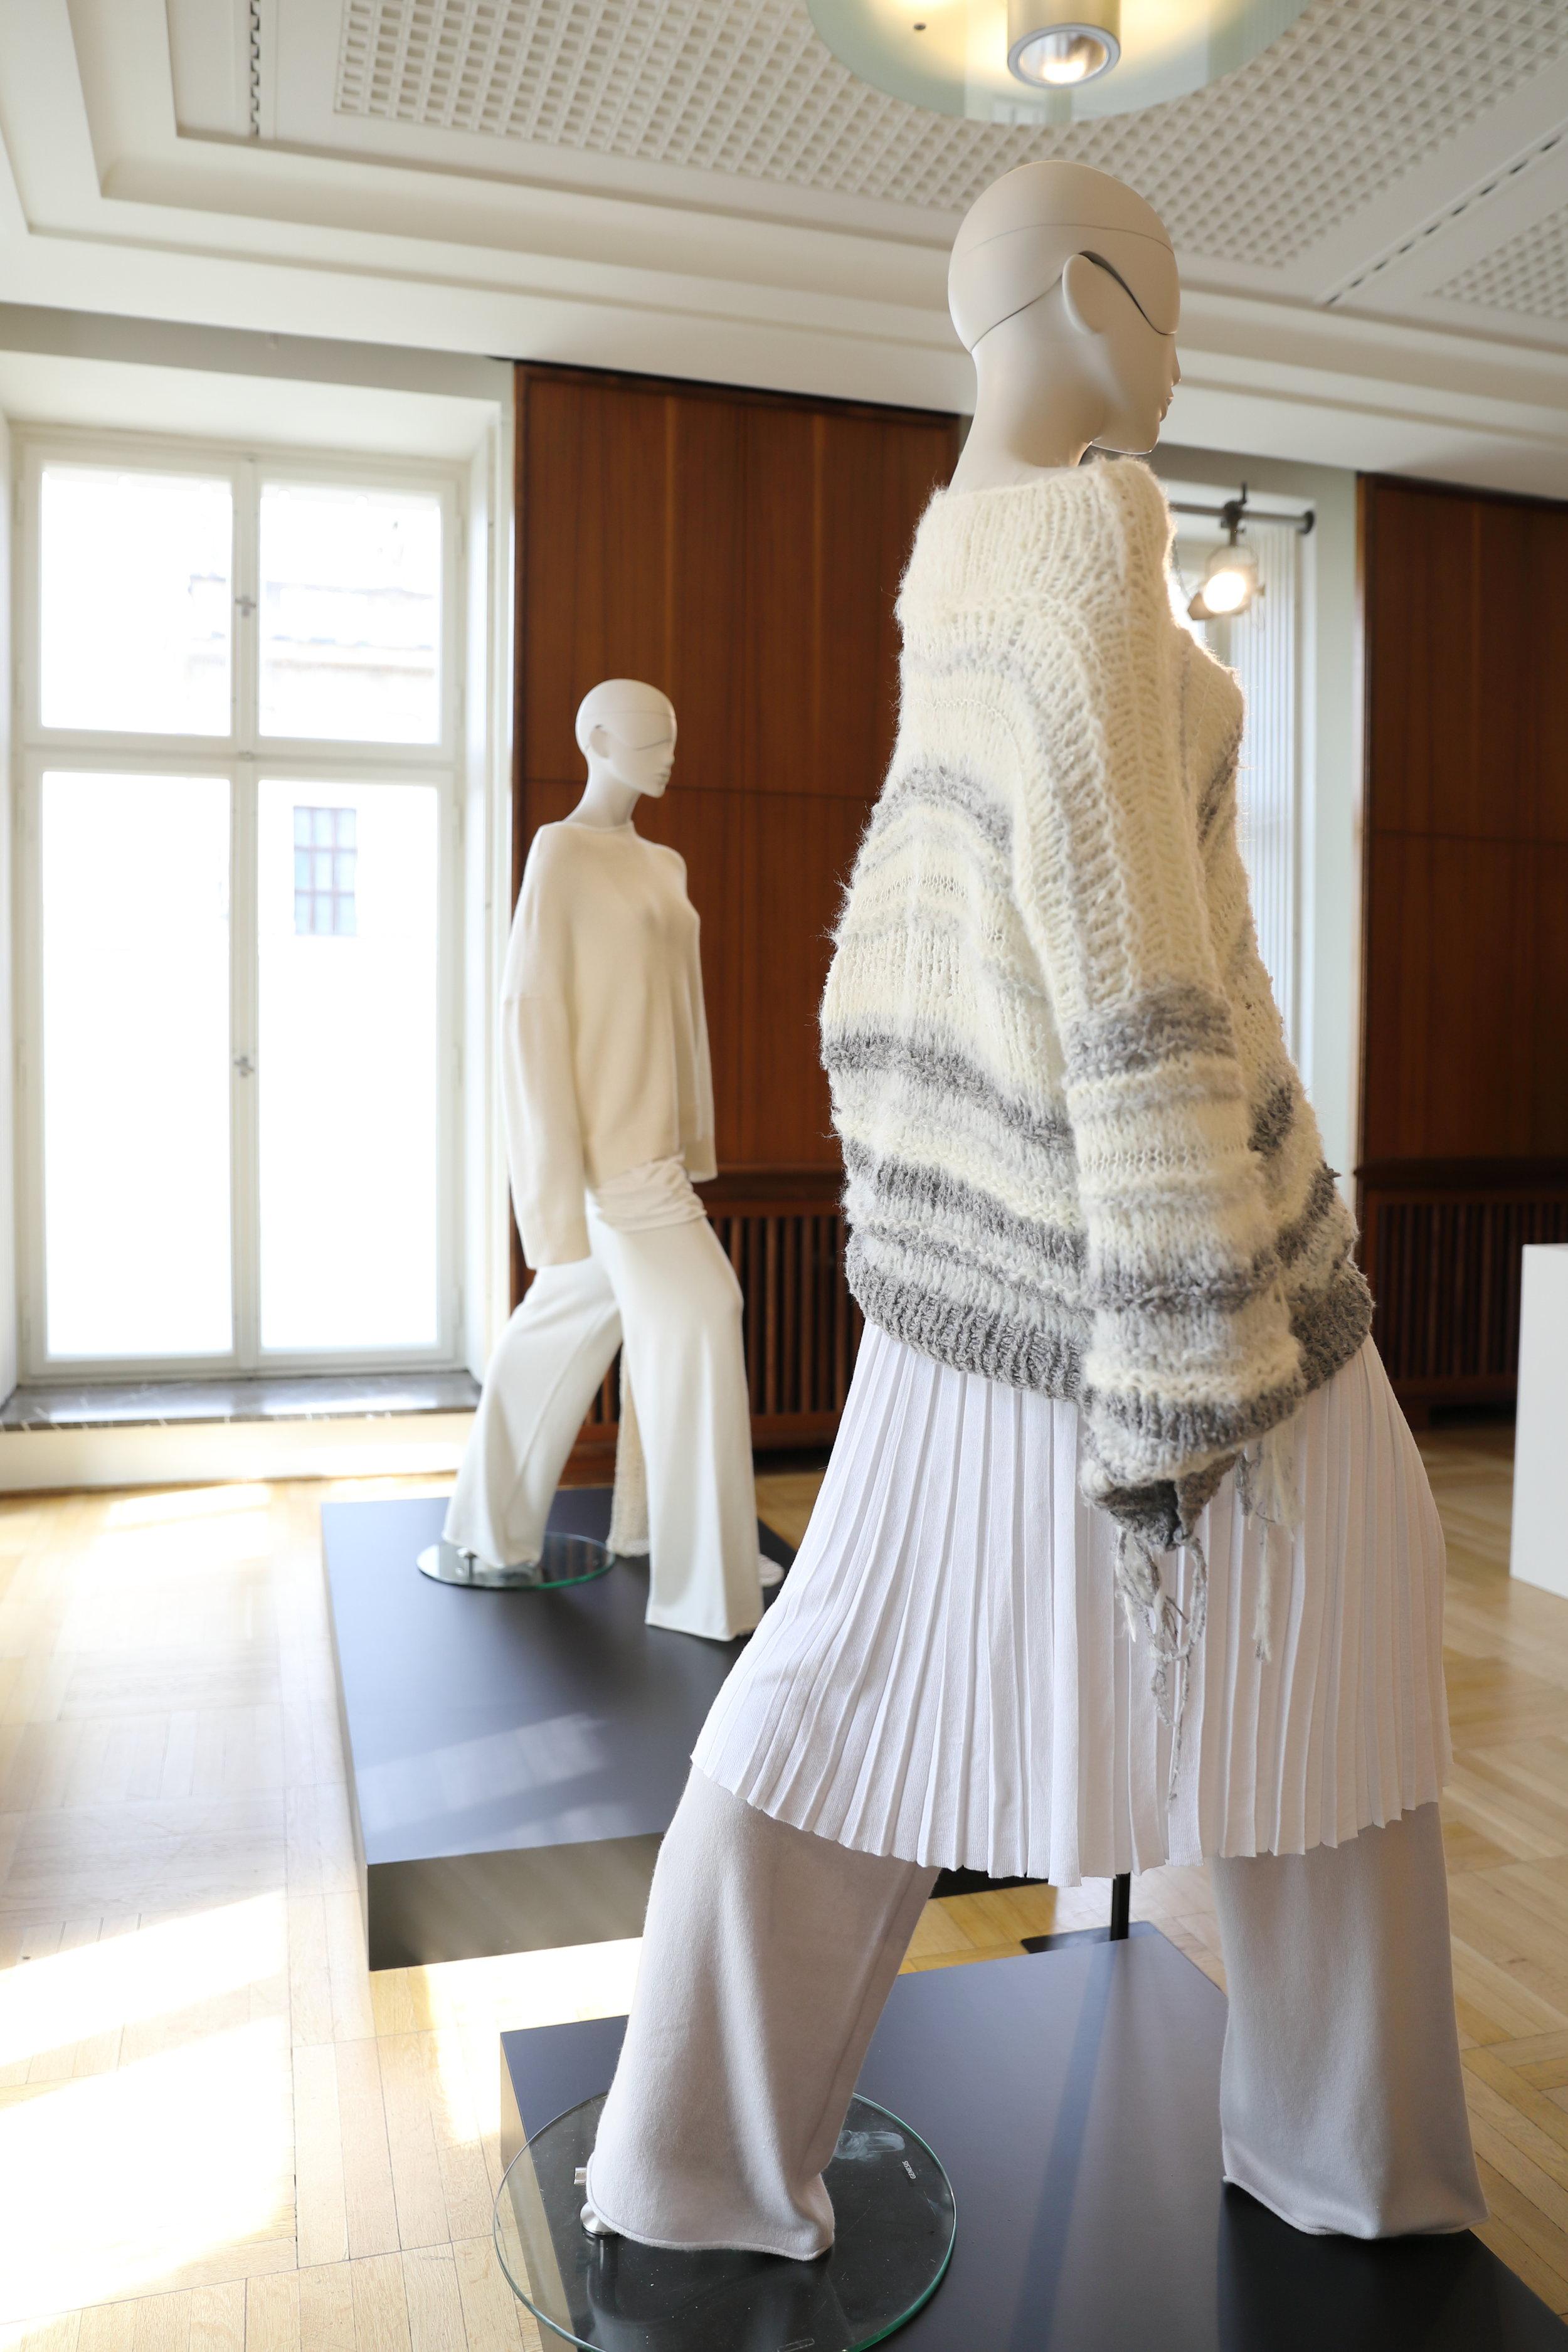 SMINFINITY auf dem Berliner Salon, Fashion Week Juli 2018, Spring Summer 2019. Knitwear Hamburg Germany, Foto: Holger Stoehrmann, mail@stoehrmann.com, 0177-6302754